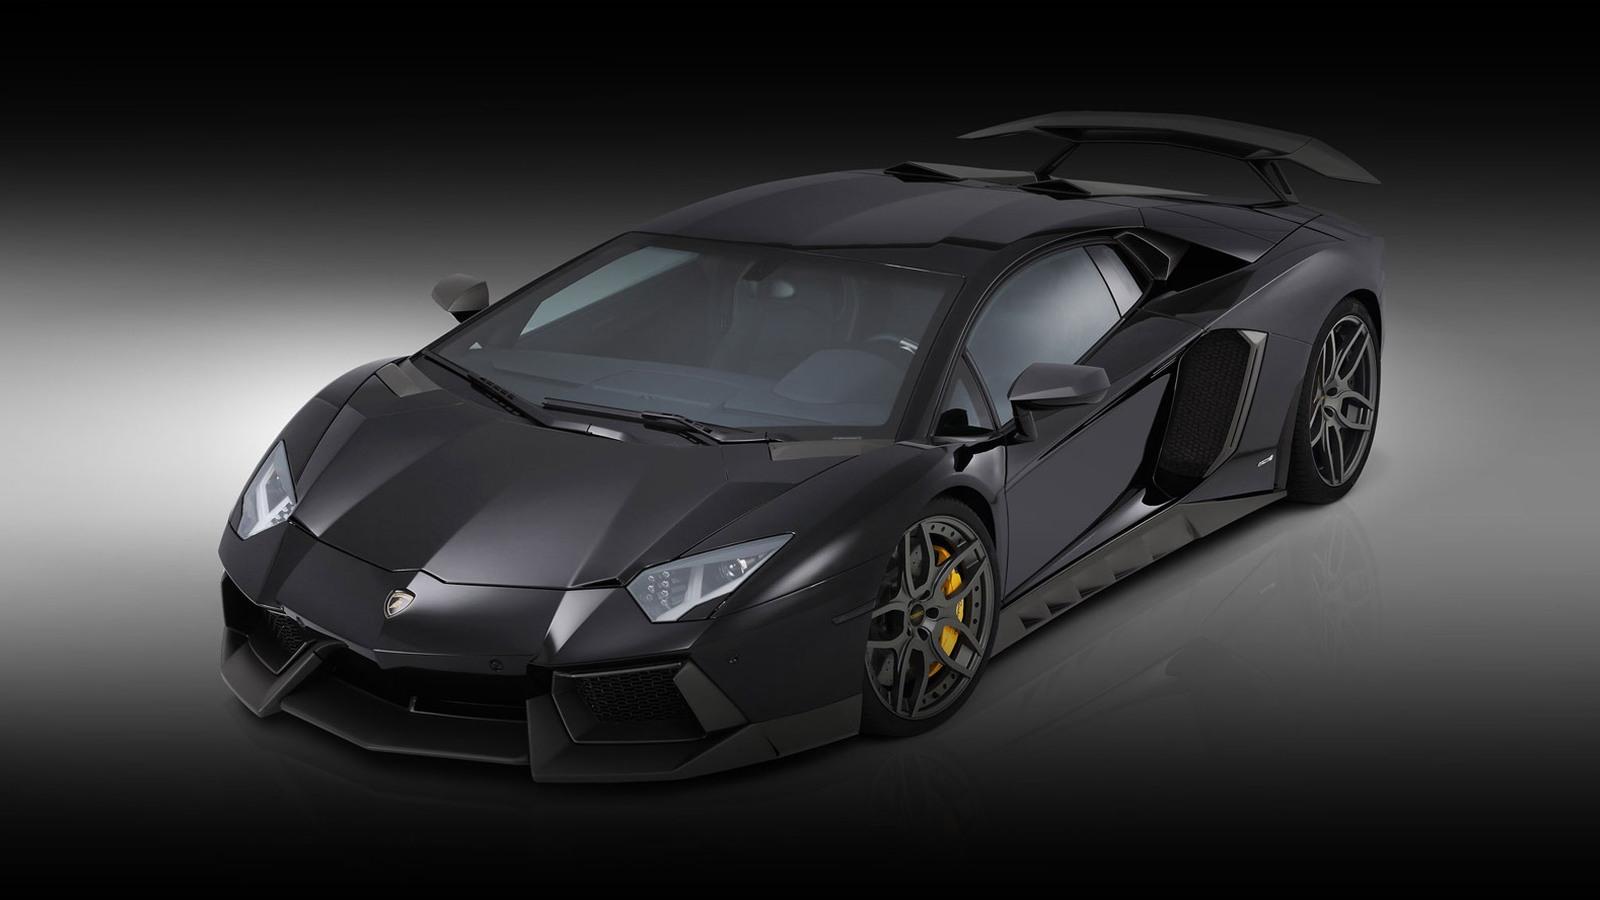 Novitec Torado tuning program for the Lamborghini Aventador LP 700-4